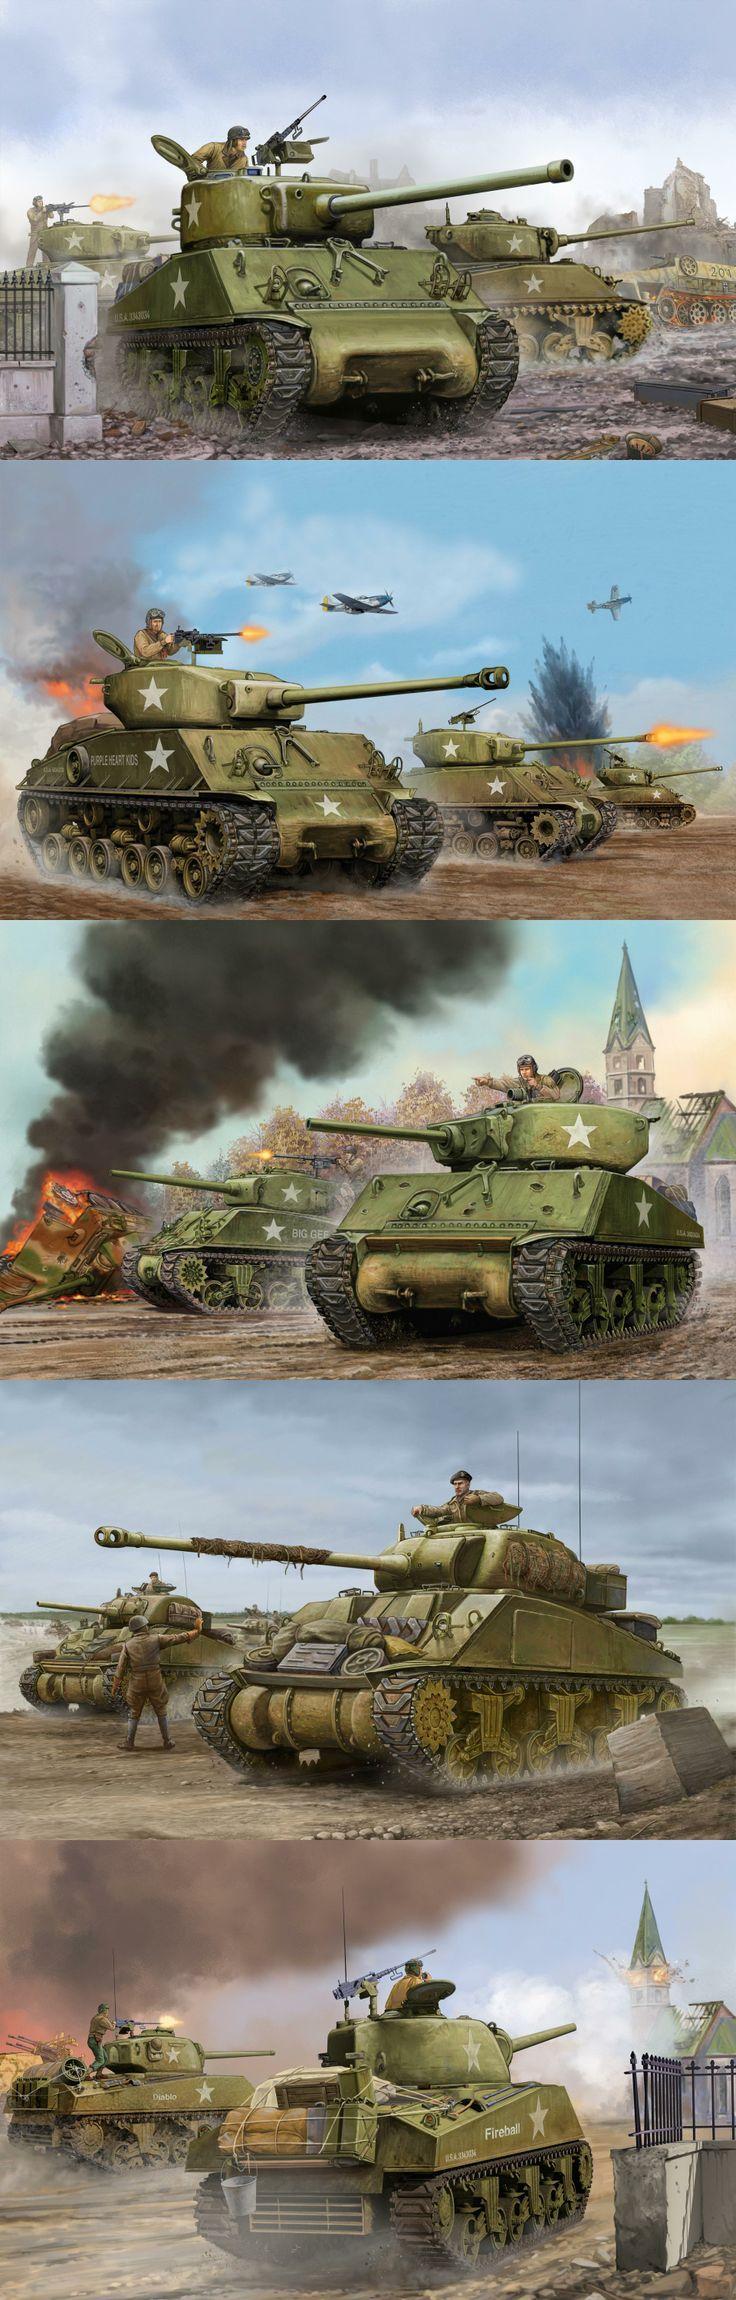 us: afv: American Medium Tanks: M4A3 Sherman (76 mm), M4A3 Sherman (76 mm), M4 Jumbo Sherman, Sherman Firefly,M4A2 Sherman (75 mm)